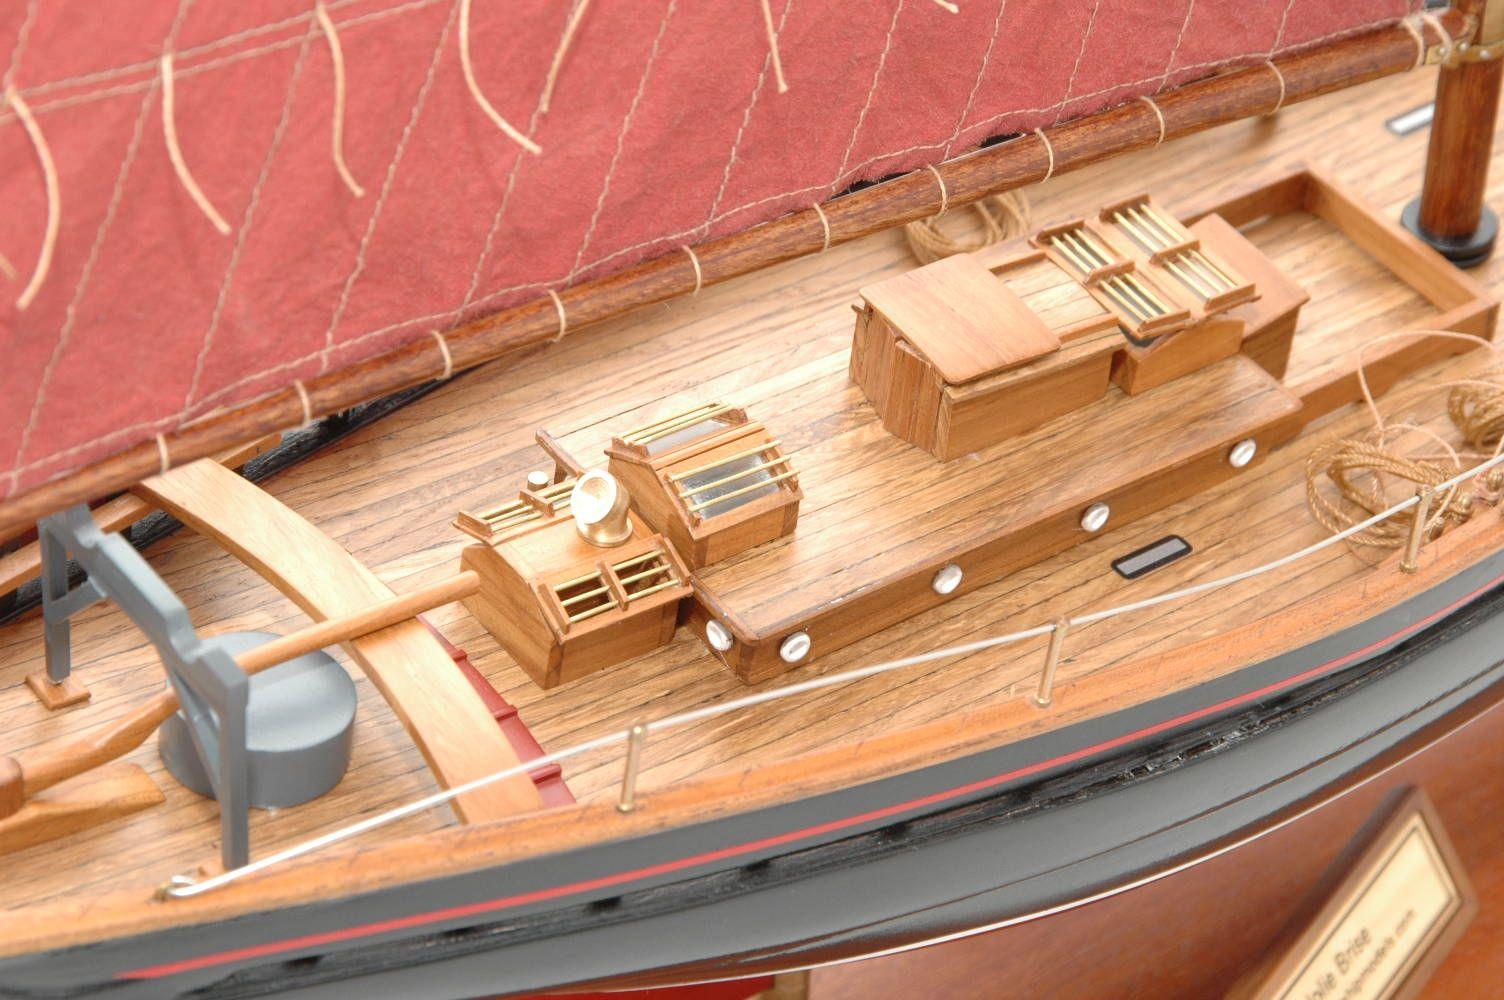 654-6201-Jolie-Brise-Model-Yacht-Premier-Range